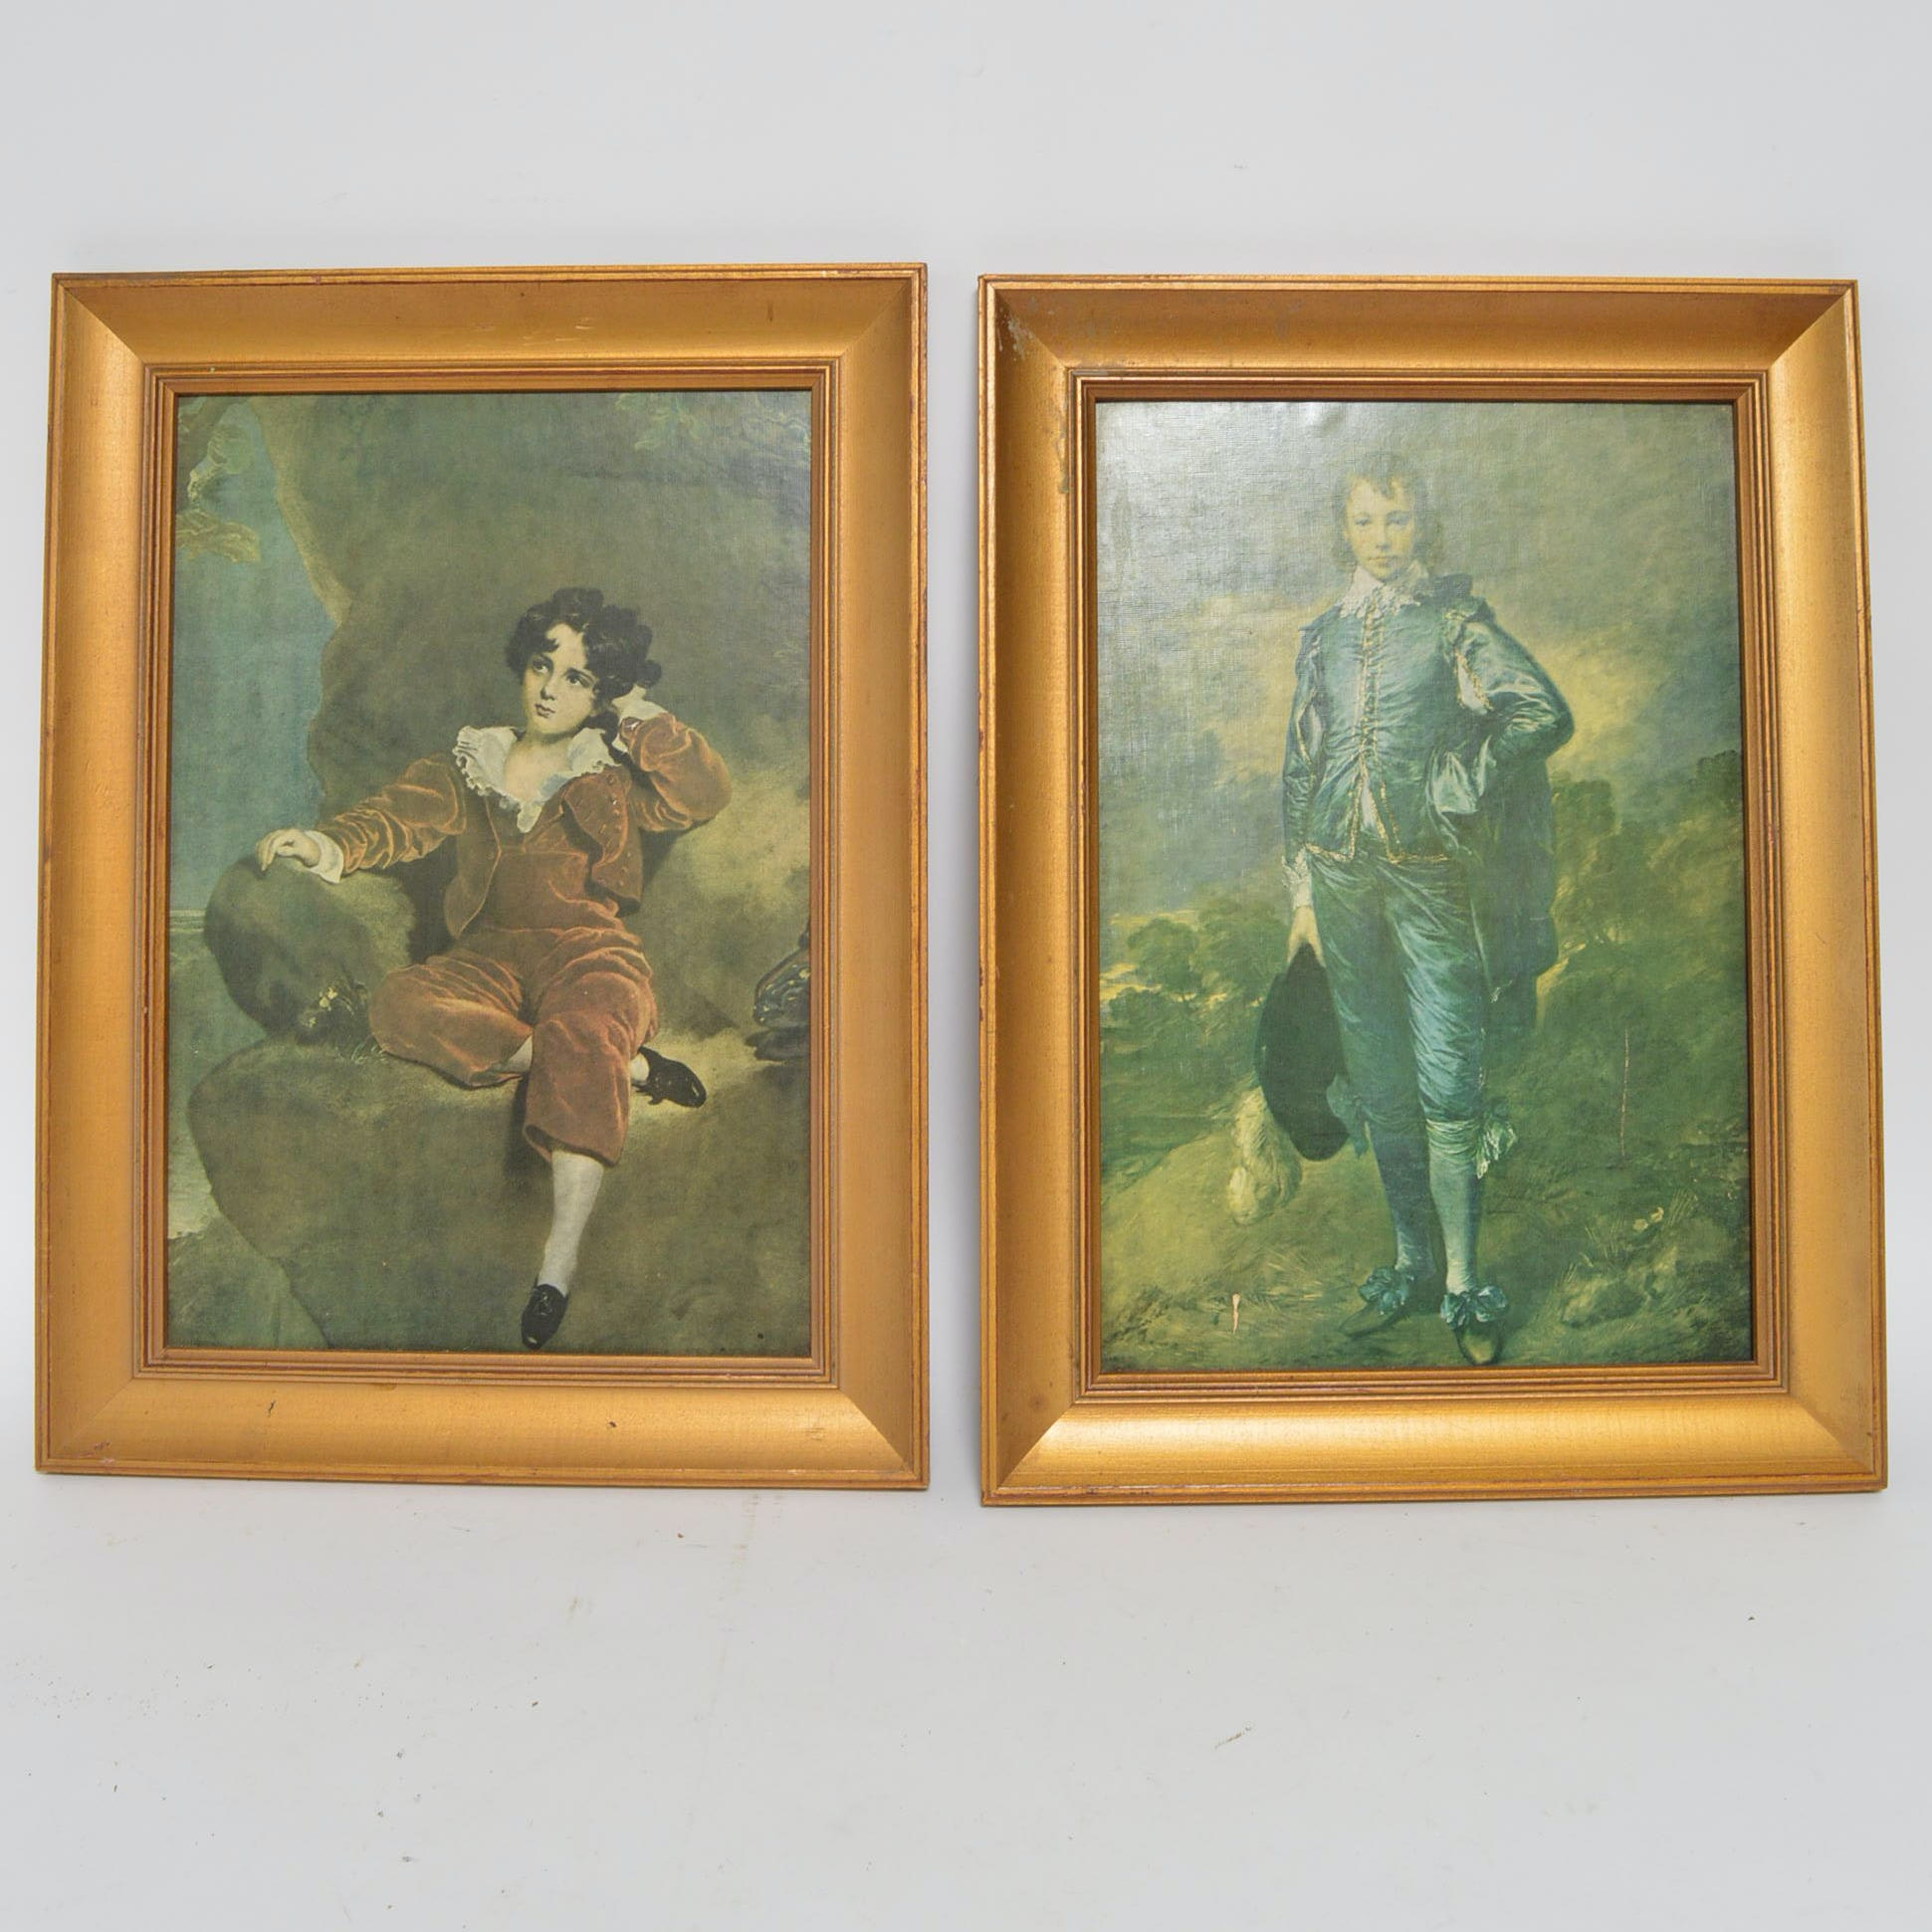 Vintage Framed Offset Lithographs by Lawrence